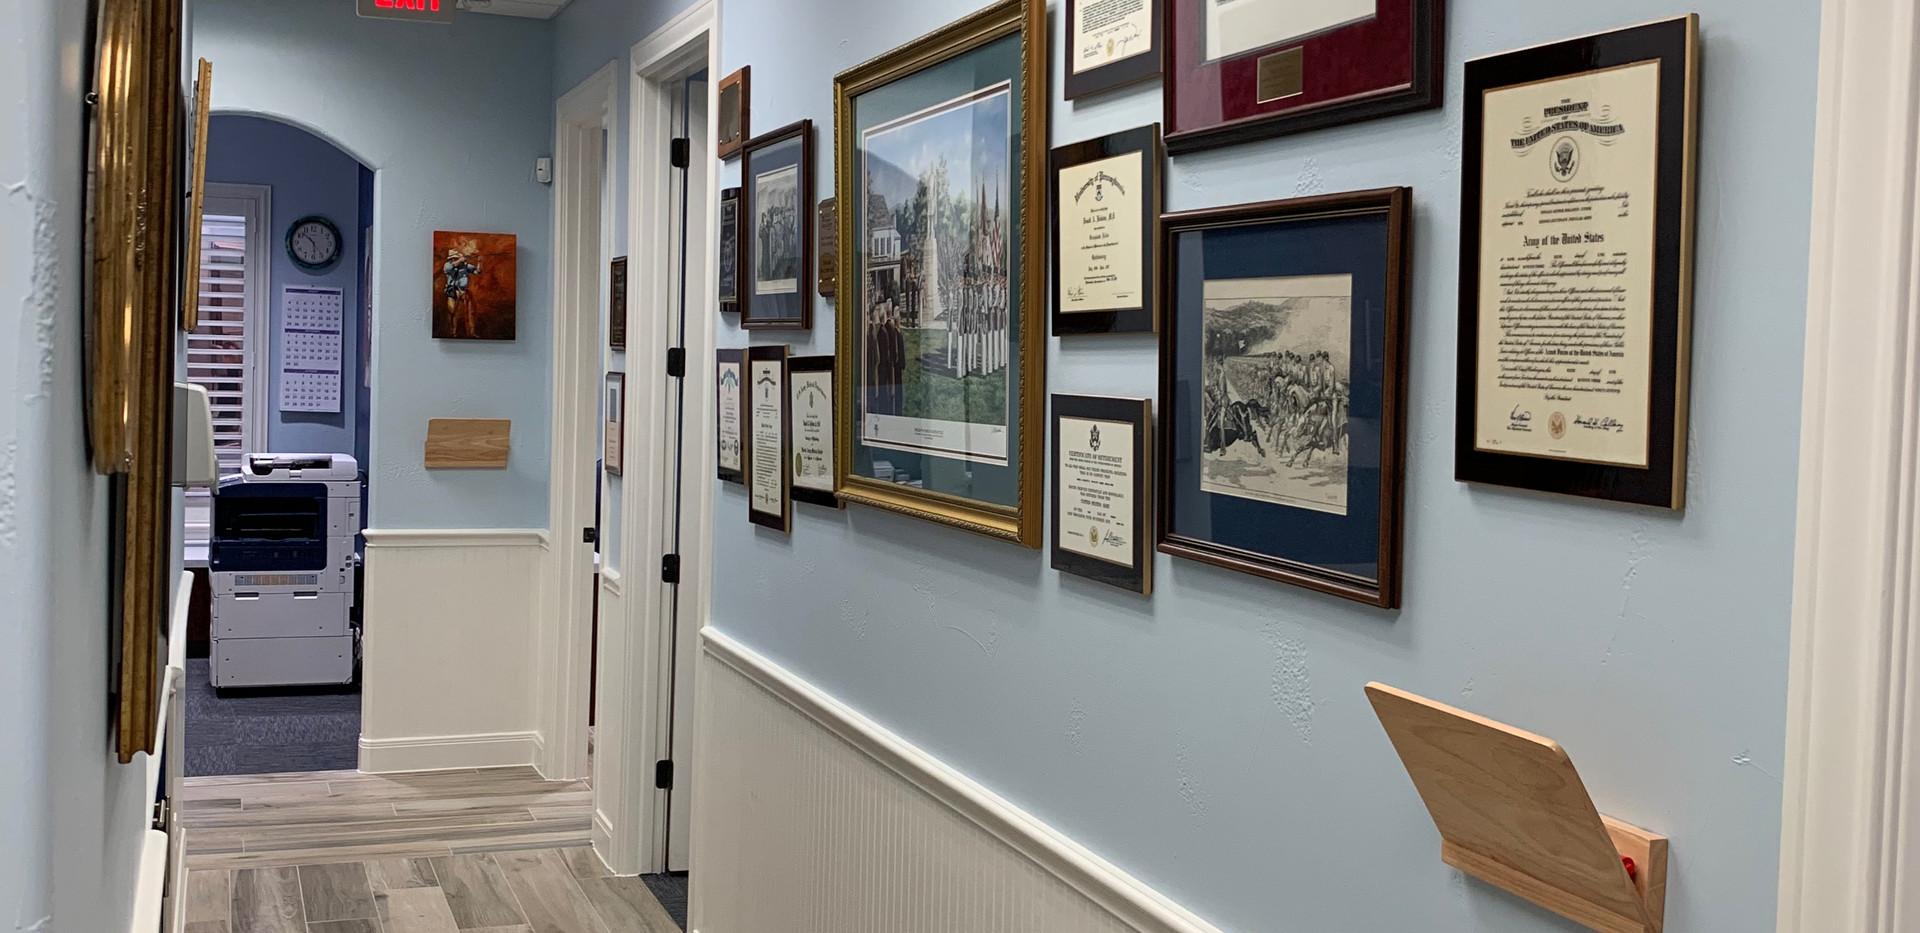 Hallway of Honors